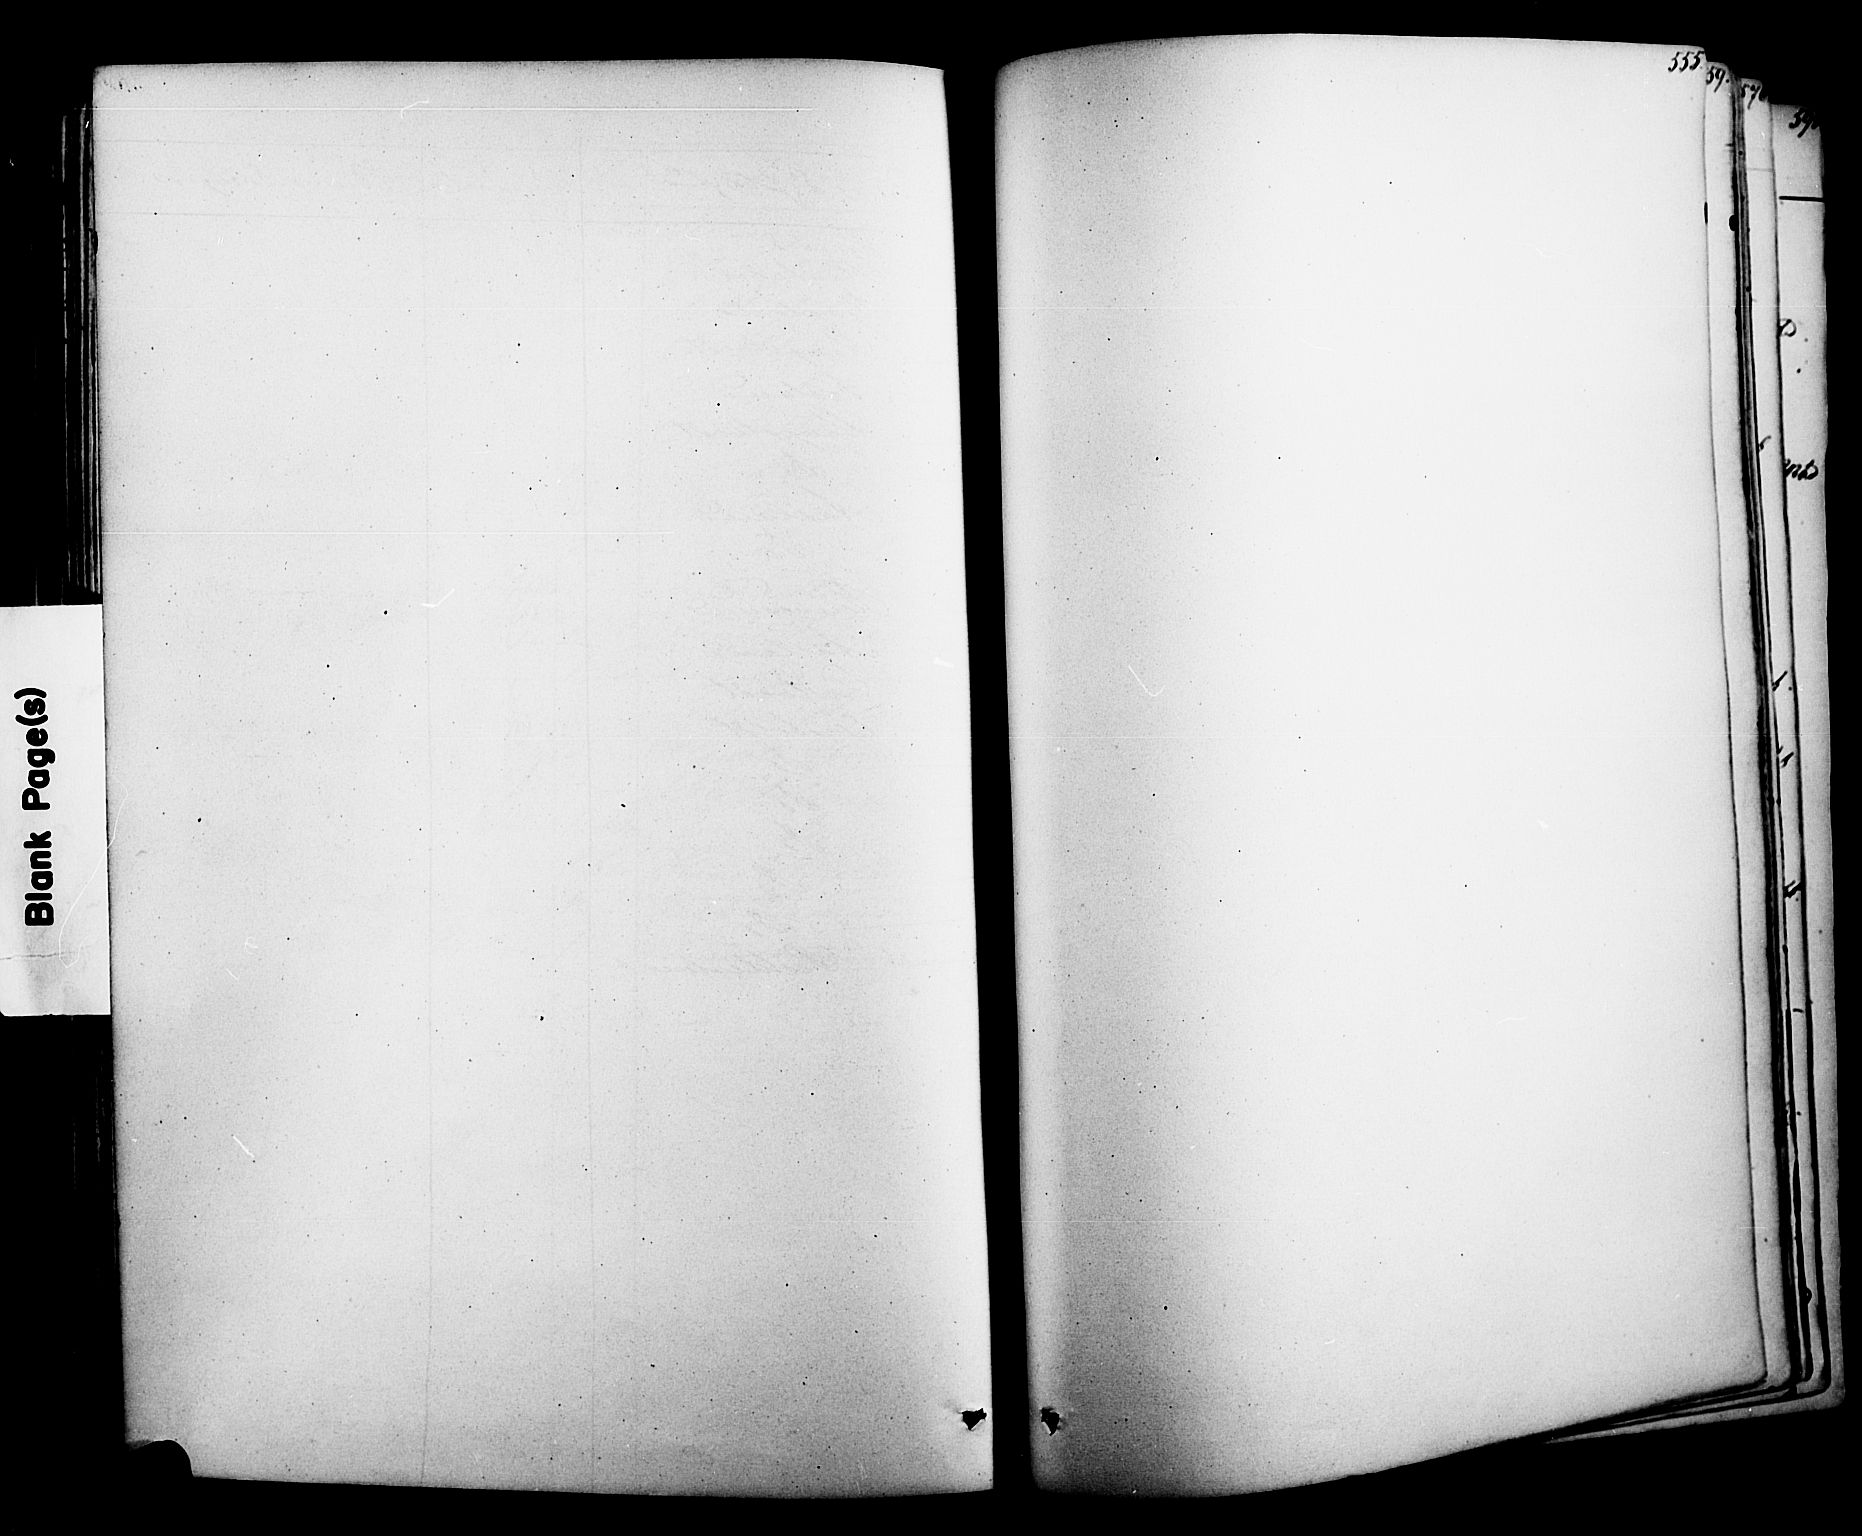 SAKO, Solum kirkebøker, F/Fa/L0006: Ministerialbok nr. I 6, 1844-1855, s. 555